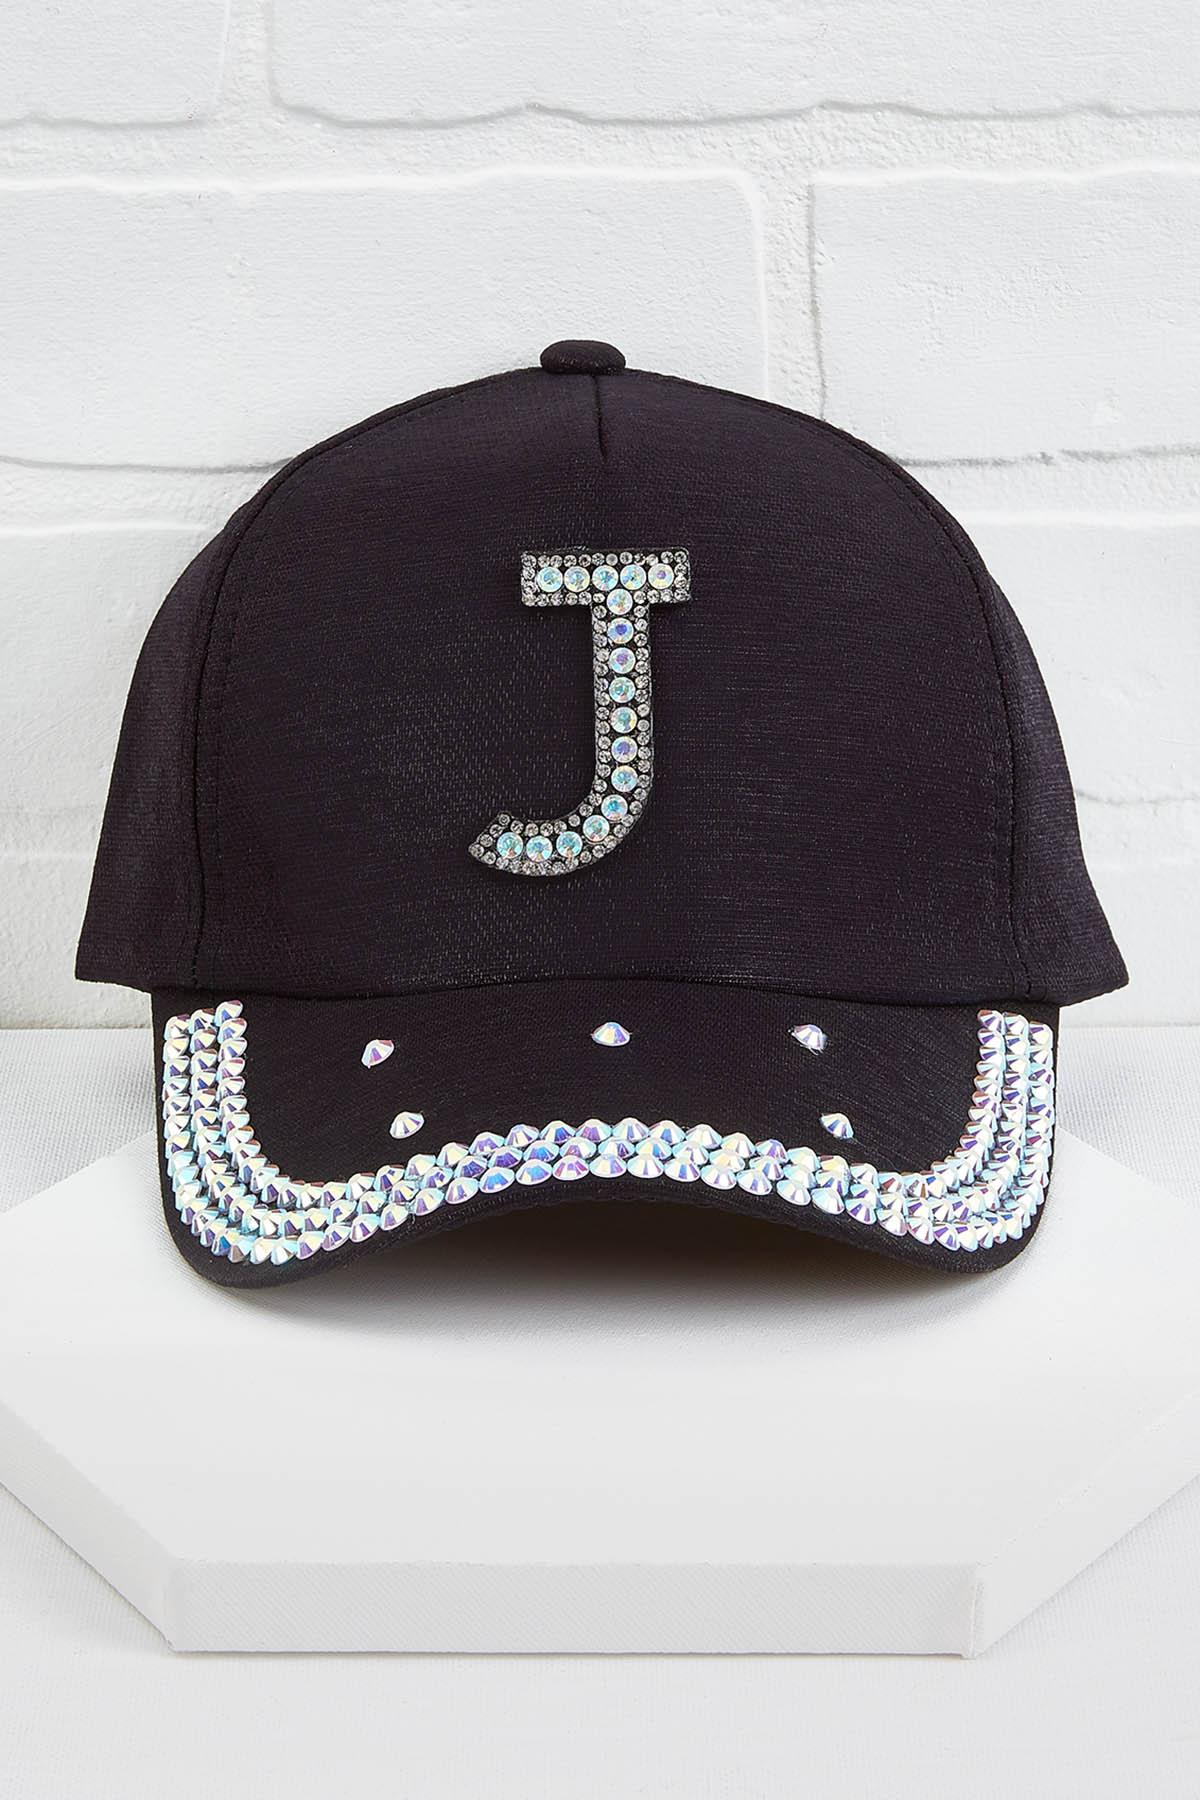 J Initial Bling Baseball Cap